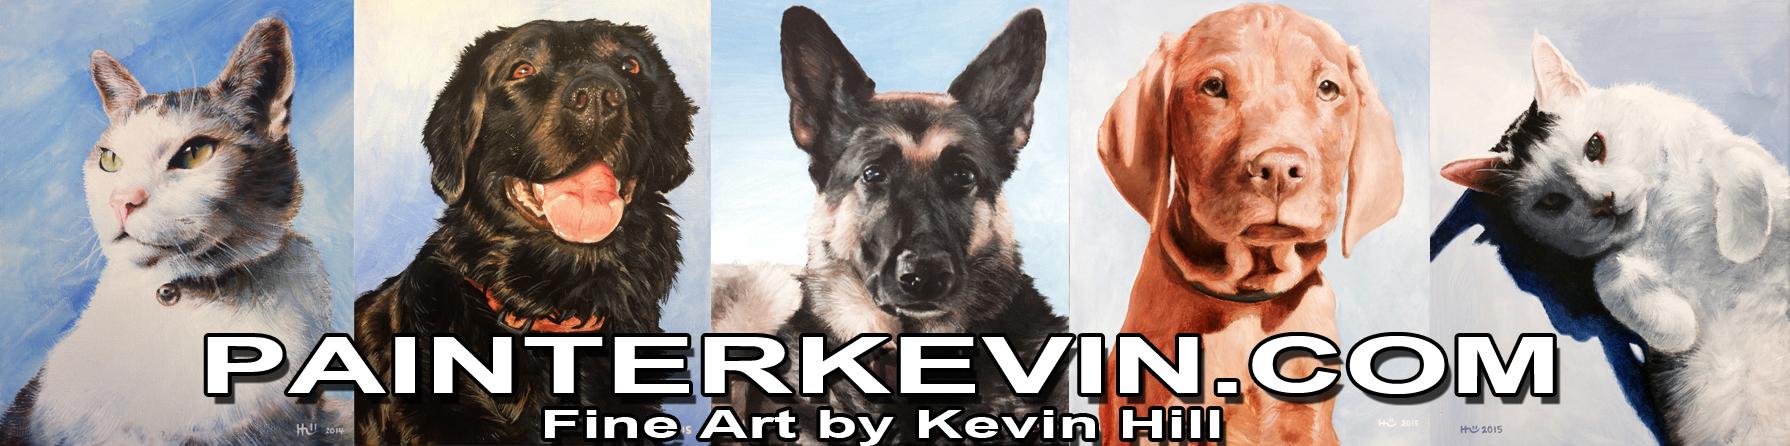 PainterKevin.com March Banner